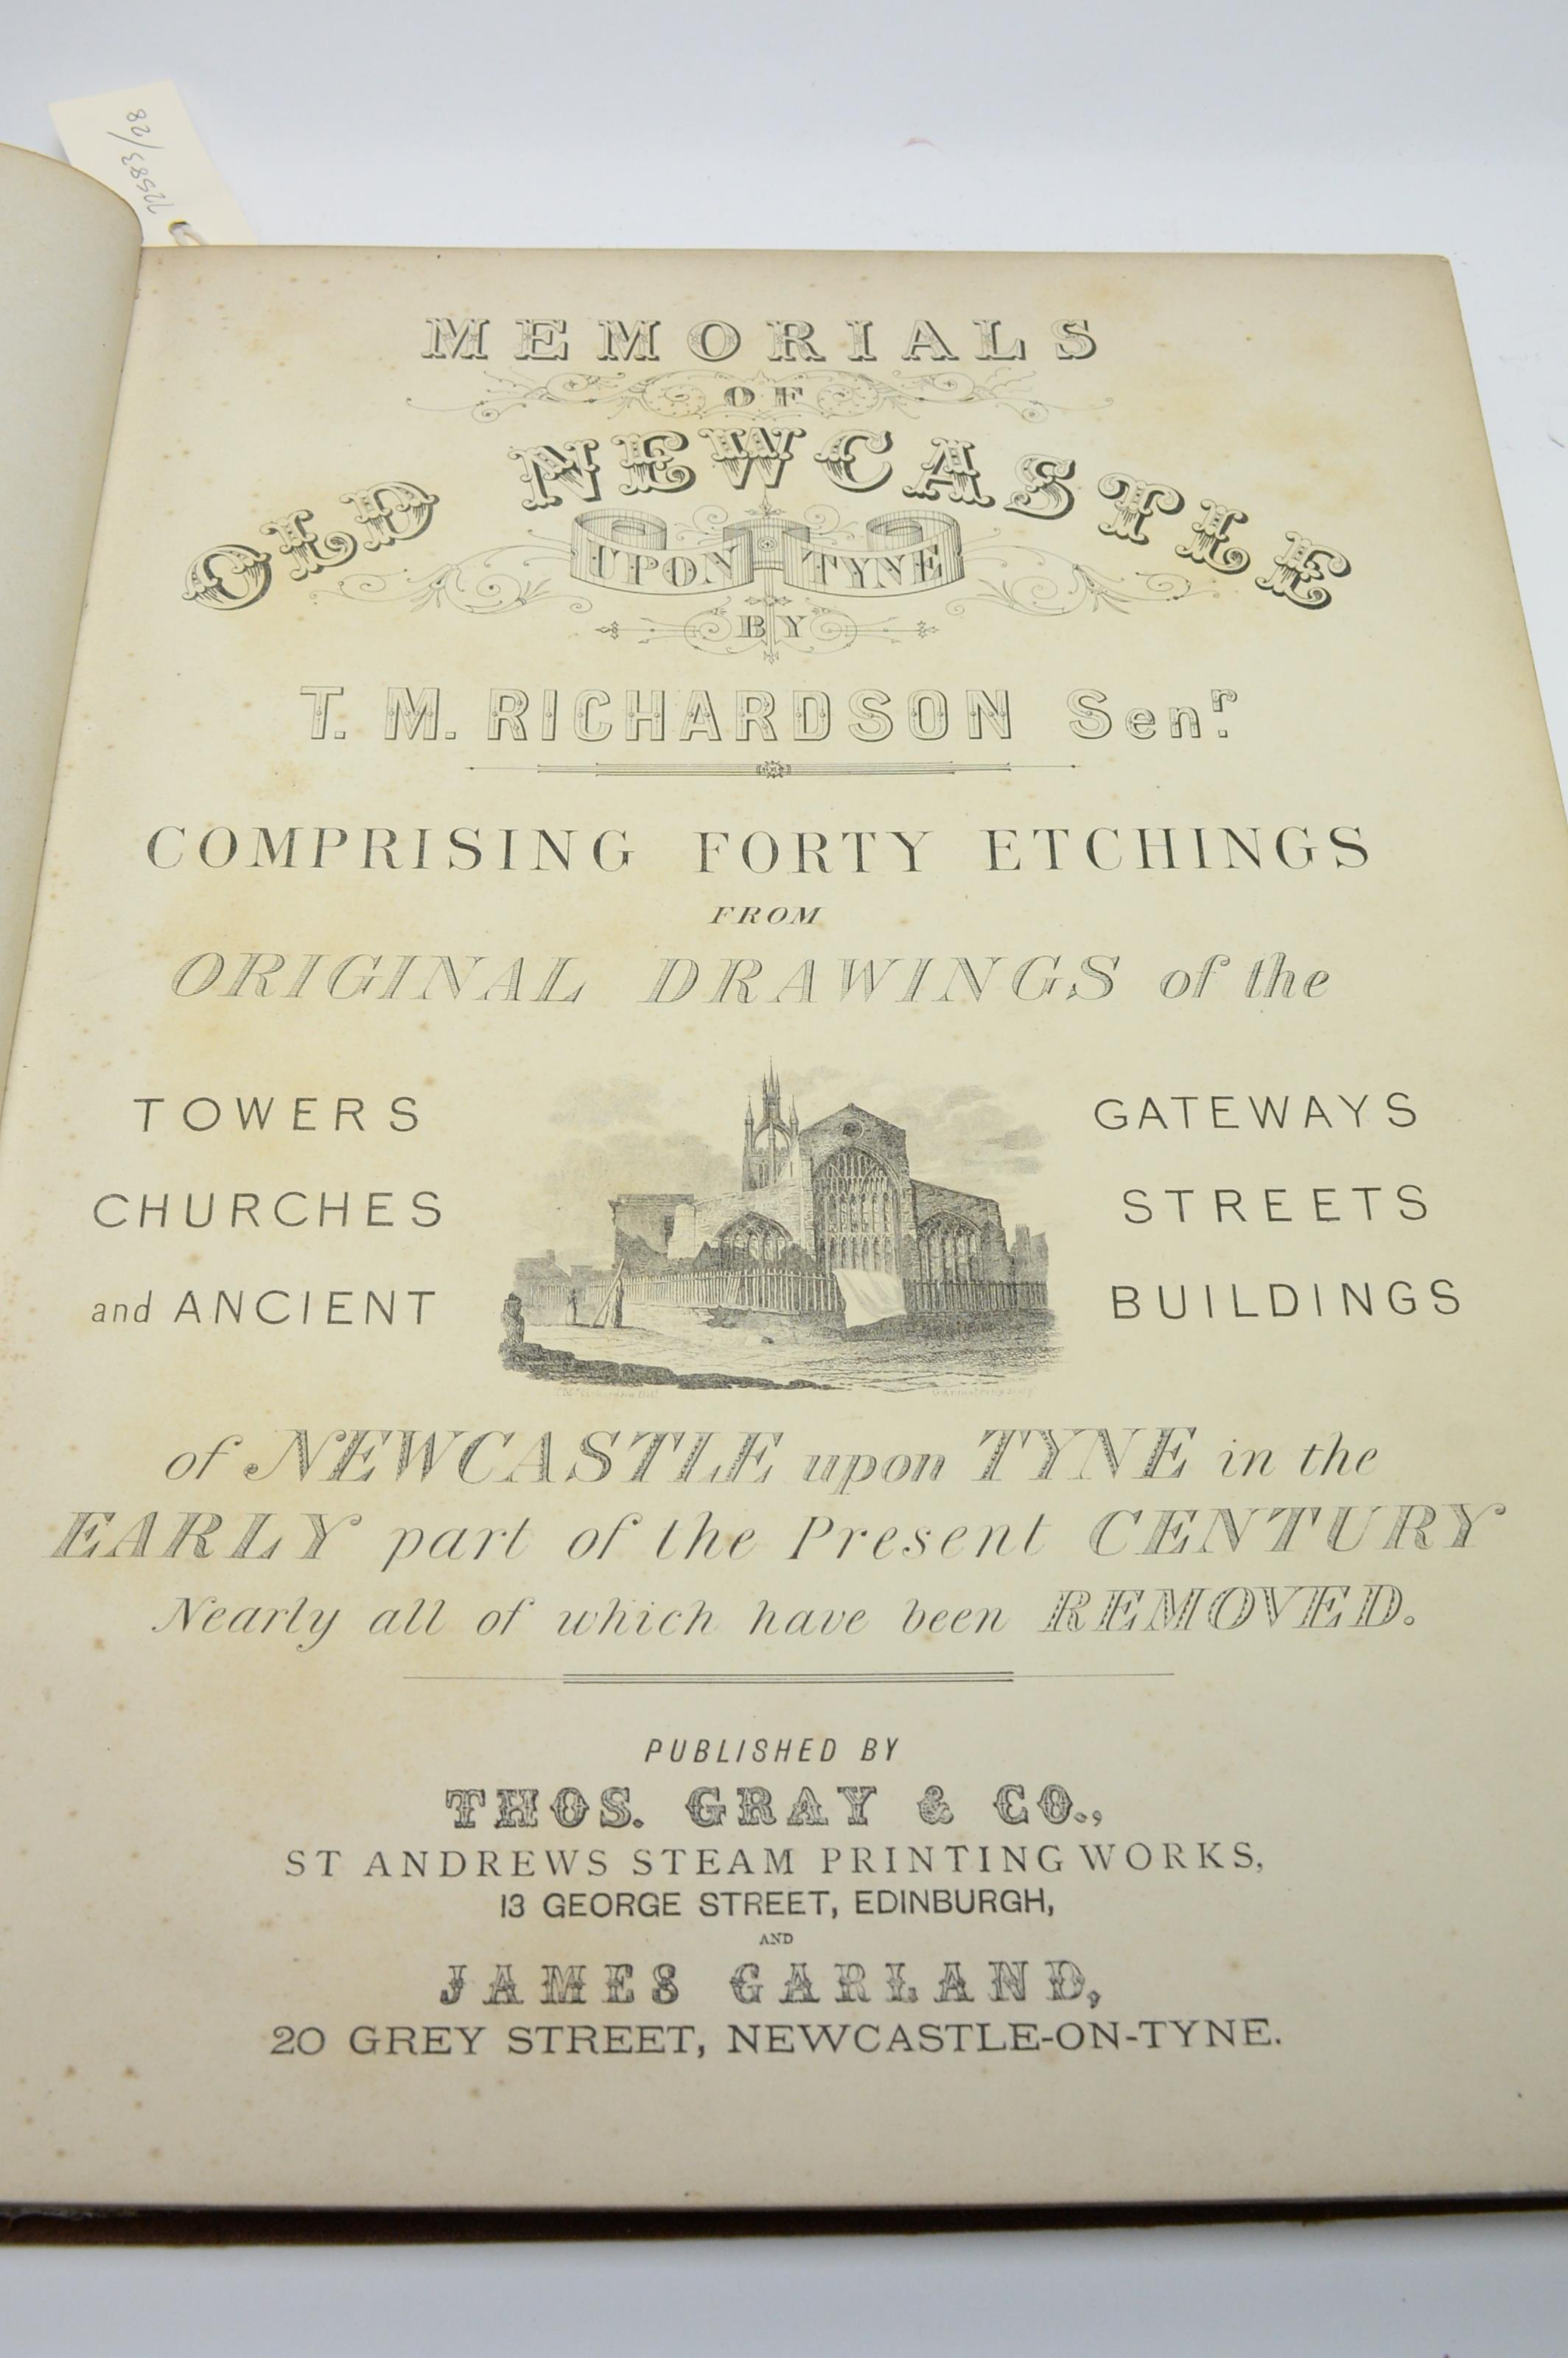 Richardson (Thomas Miles, snr.) Memorials of Old Newcastle upon Tyne. - Image 2 of 2